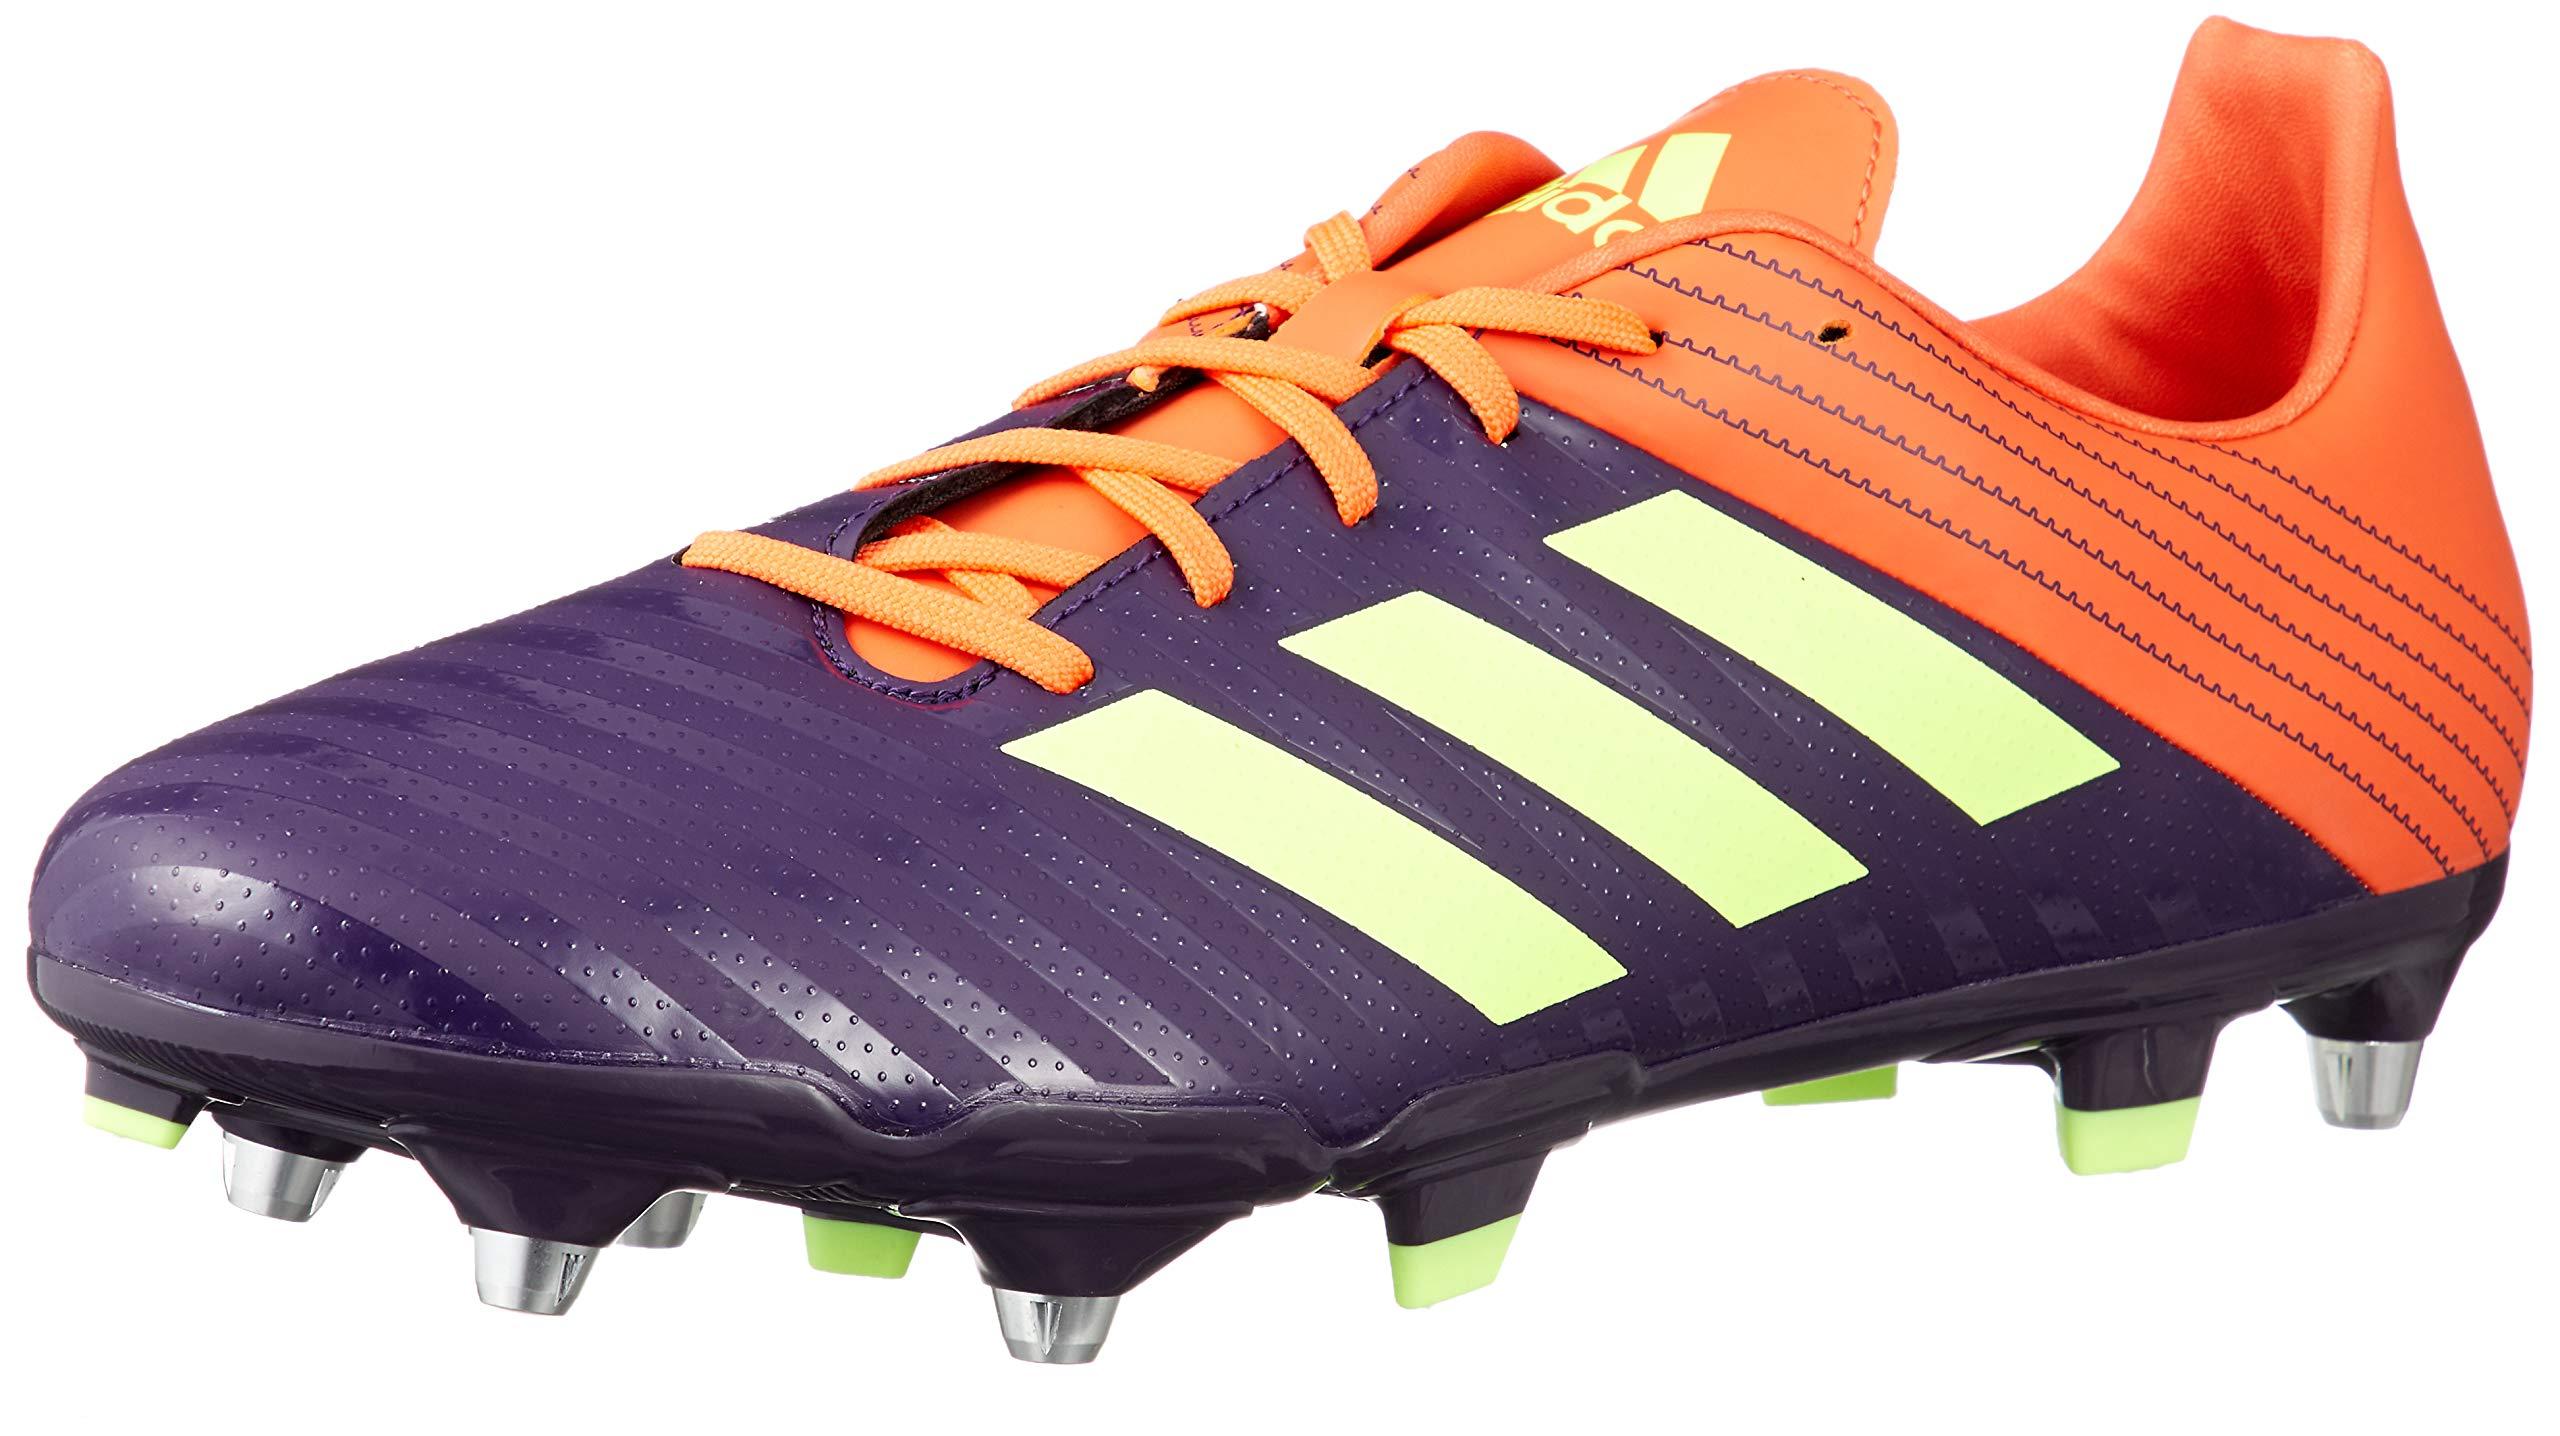 adidas Malice SG Rugby Boots, Orange (US 13.5) by adidas